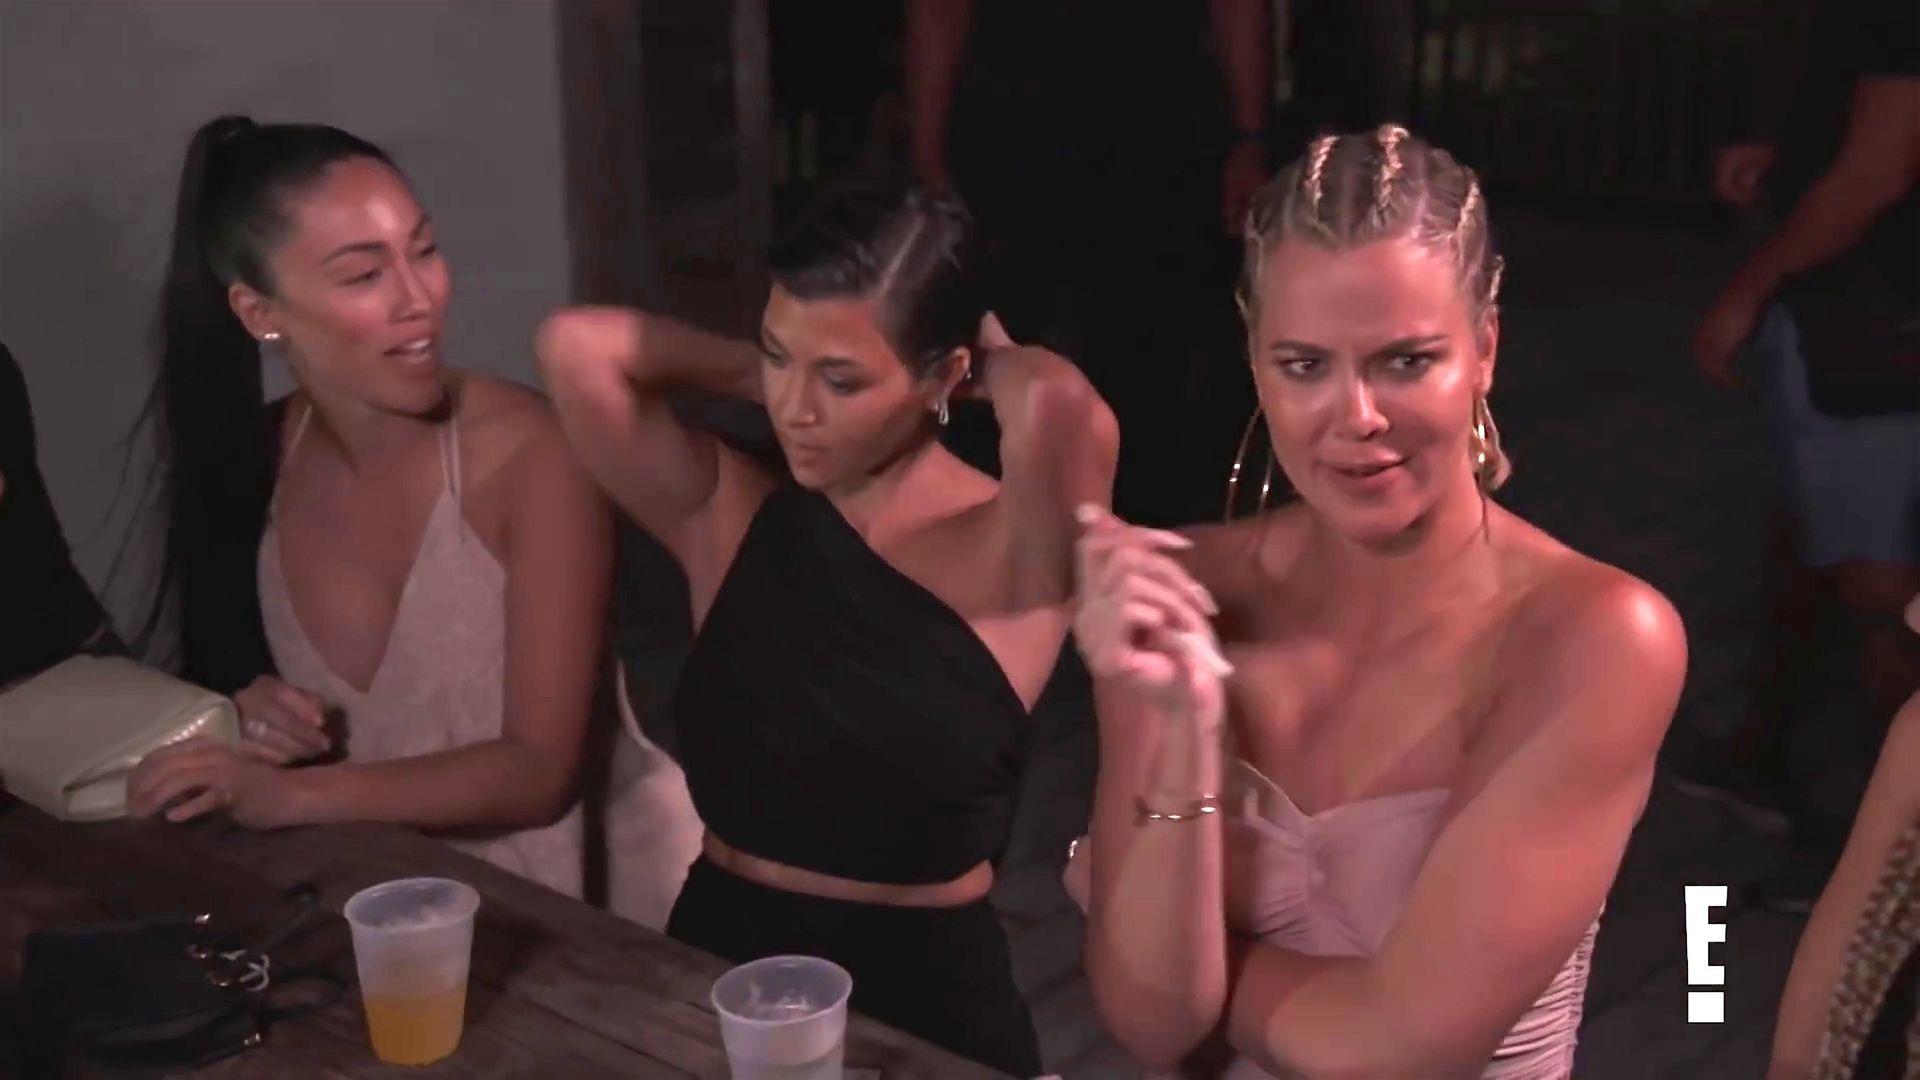 Khloé Kardashian Gets A Little Cold Without A Bra 0009